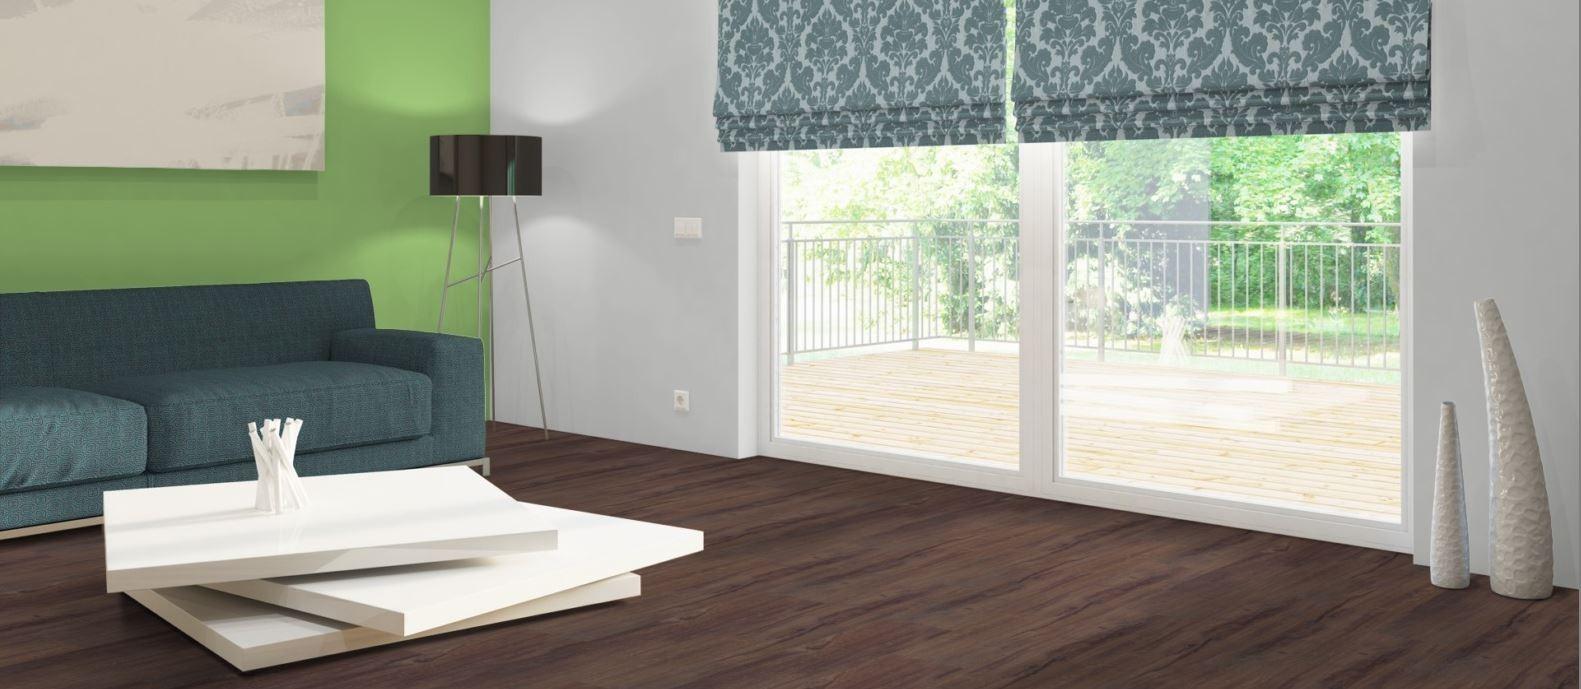 klick vinylboden project eiche weizen ns 0 5 mm nk 33 42 format 1210 x 190 x 5 mm klick. Black Bedroom Furniture Sets. Home Design Ideas